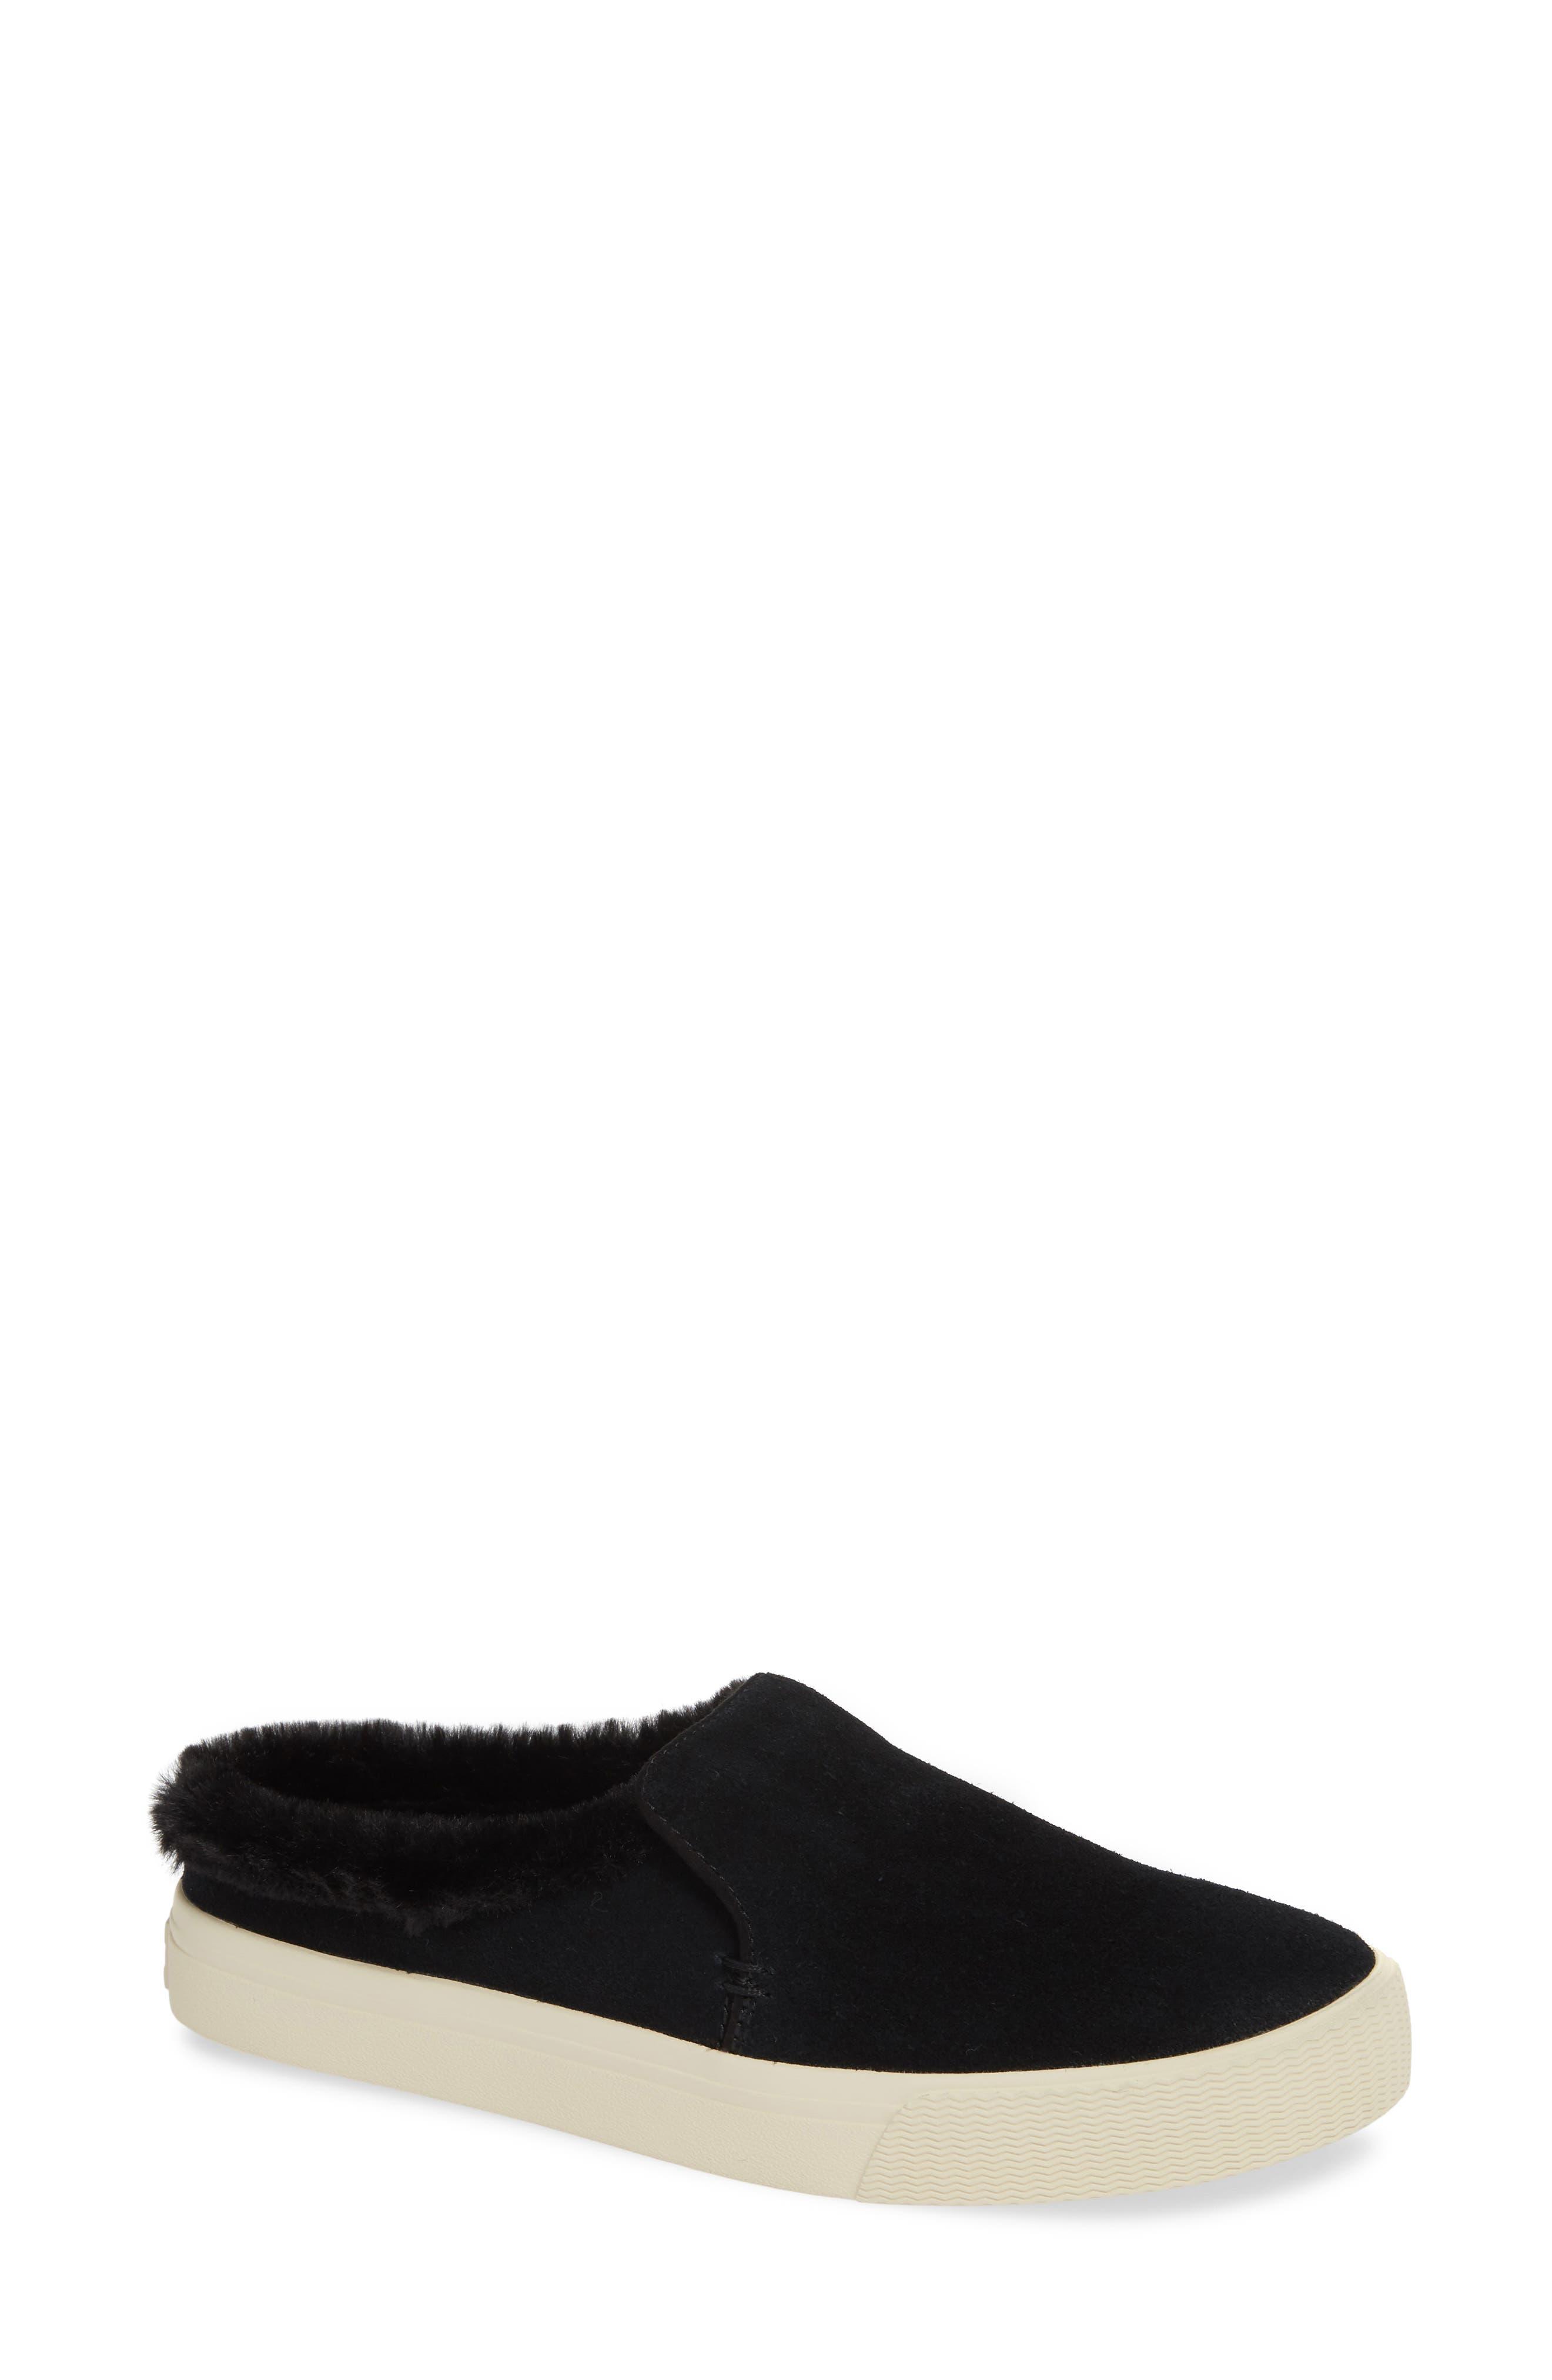 TOMS Sunrise Faux Fur Lined Slip-On Sneaker, Main, color, BLACK SUEDE